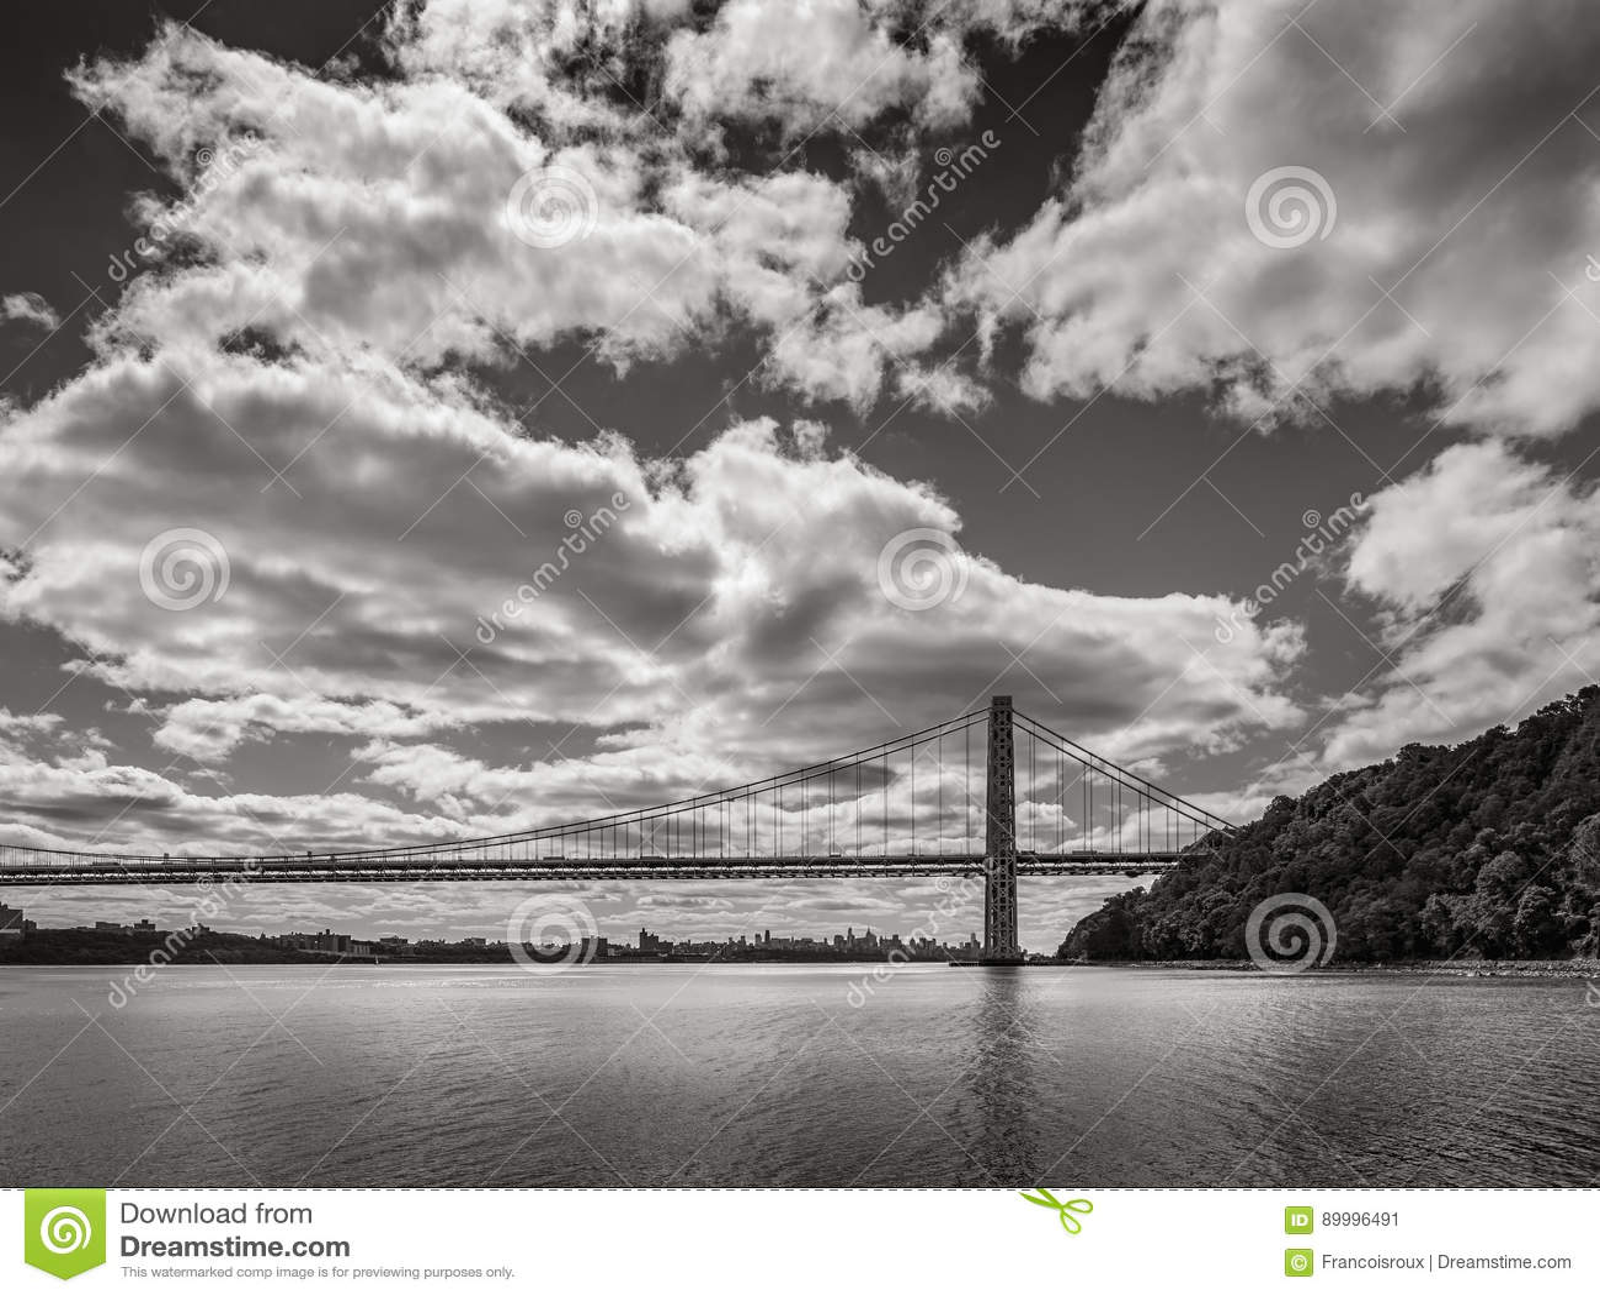 George Washington Bridge and Hudson River. New York City